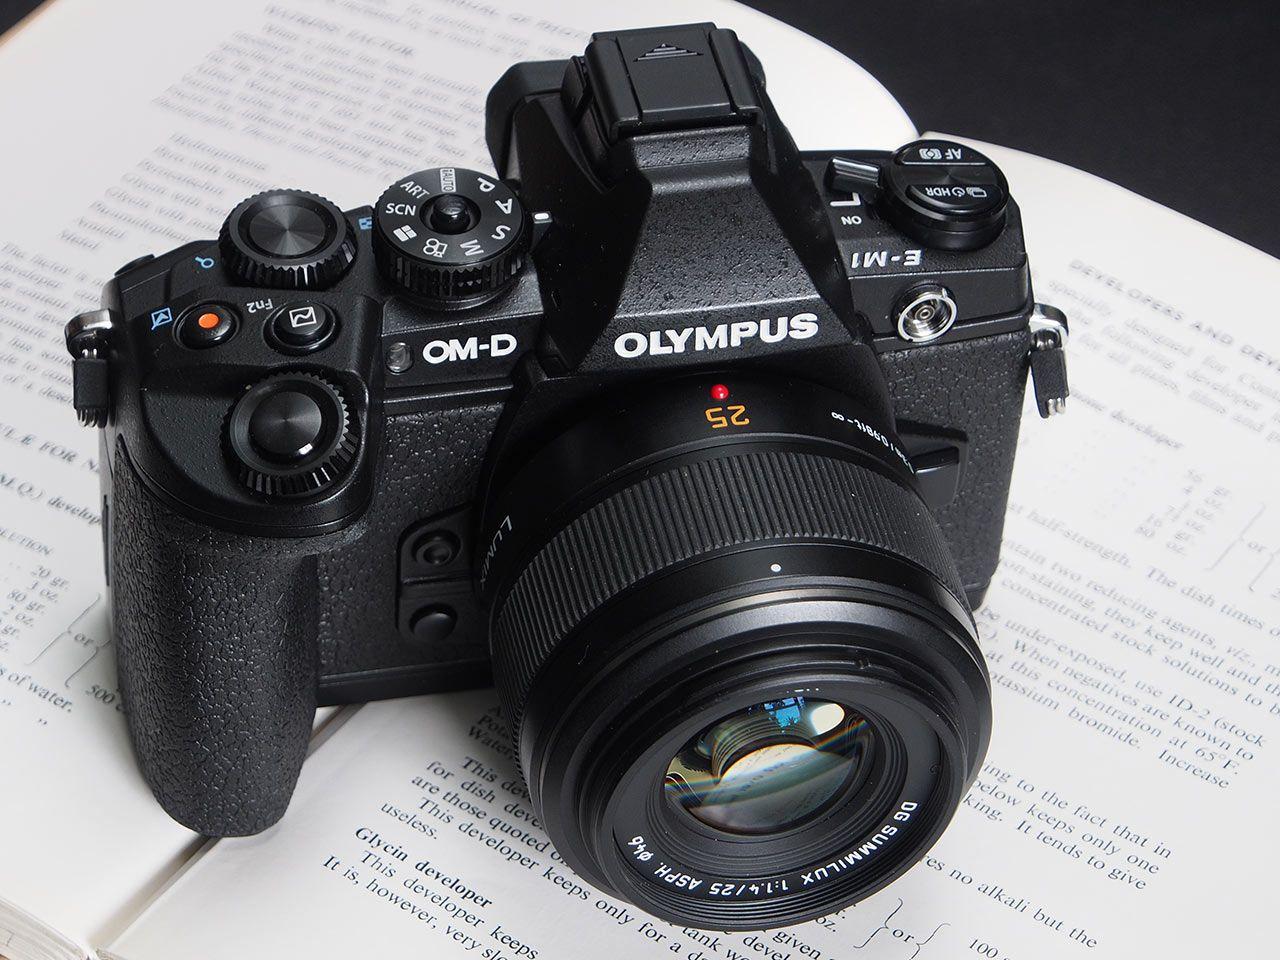 e-m1-shot2.jpg 1280×960 pikseli